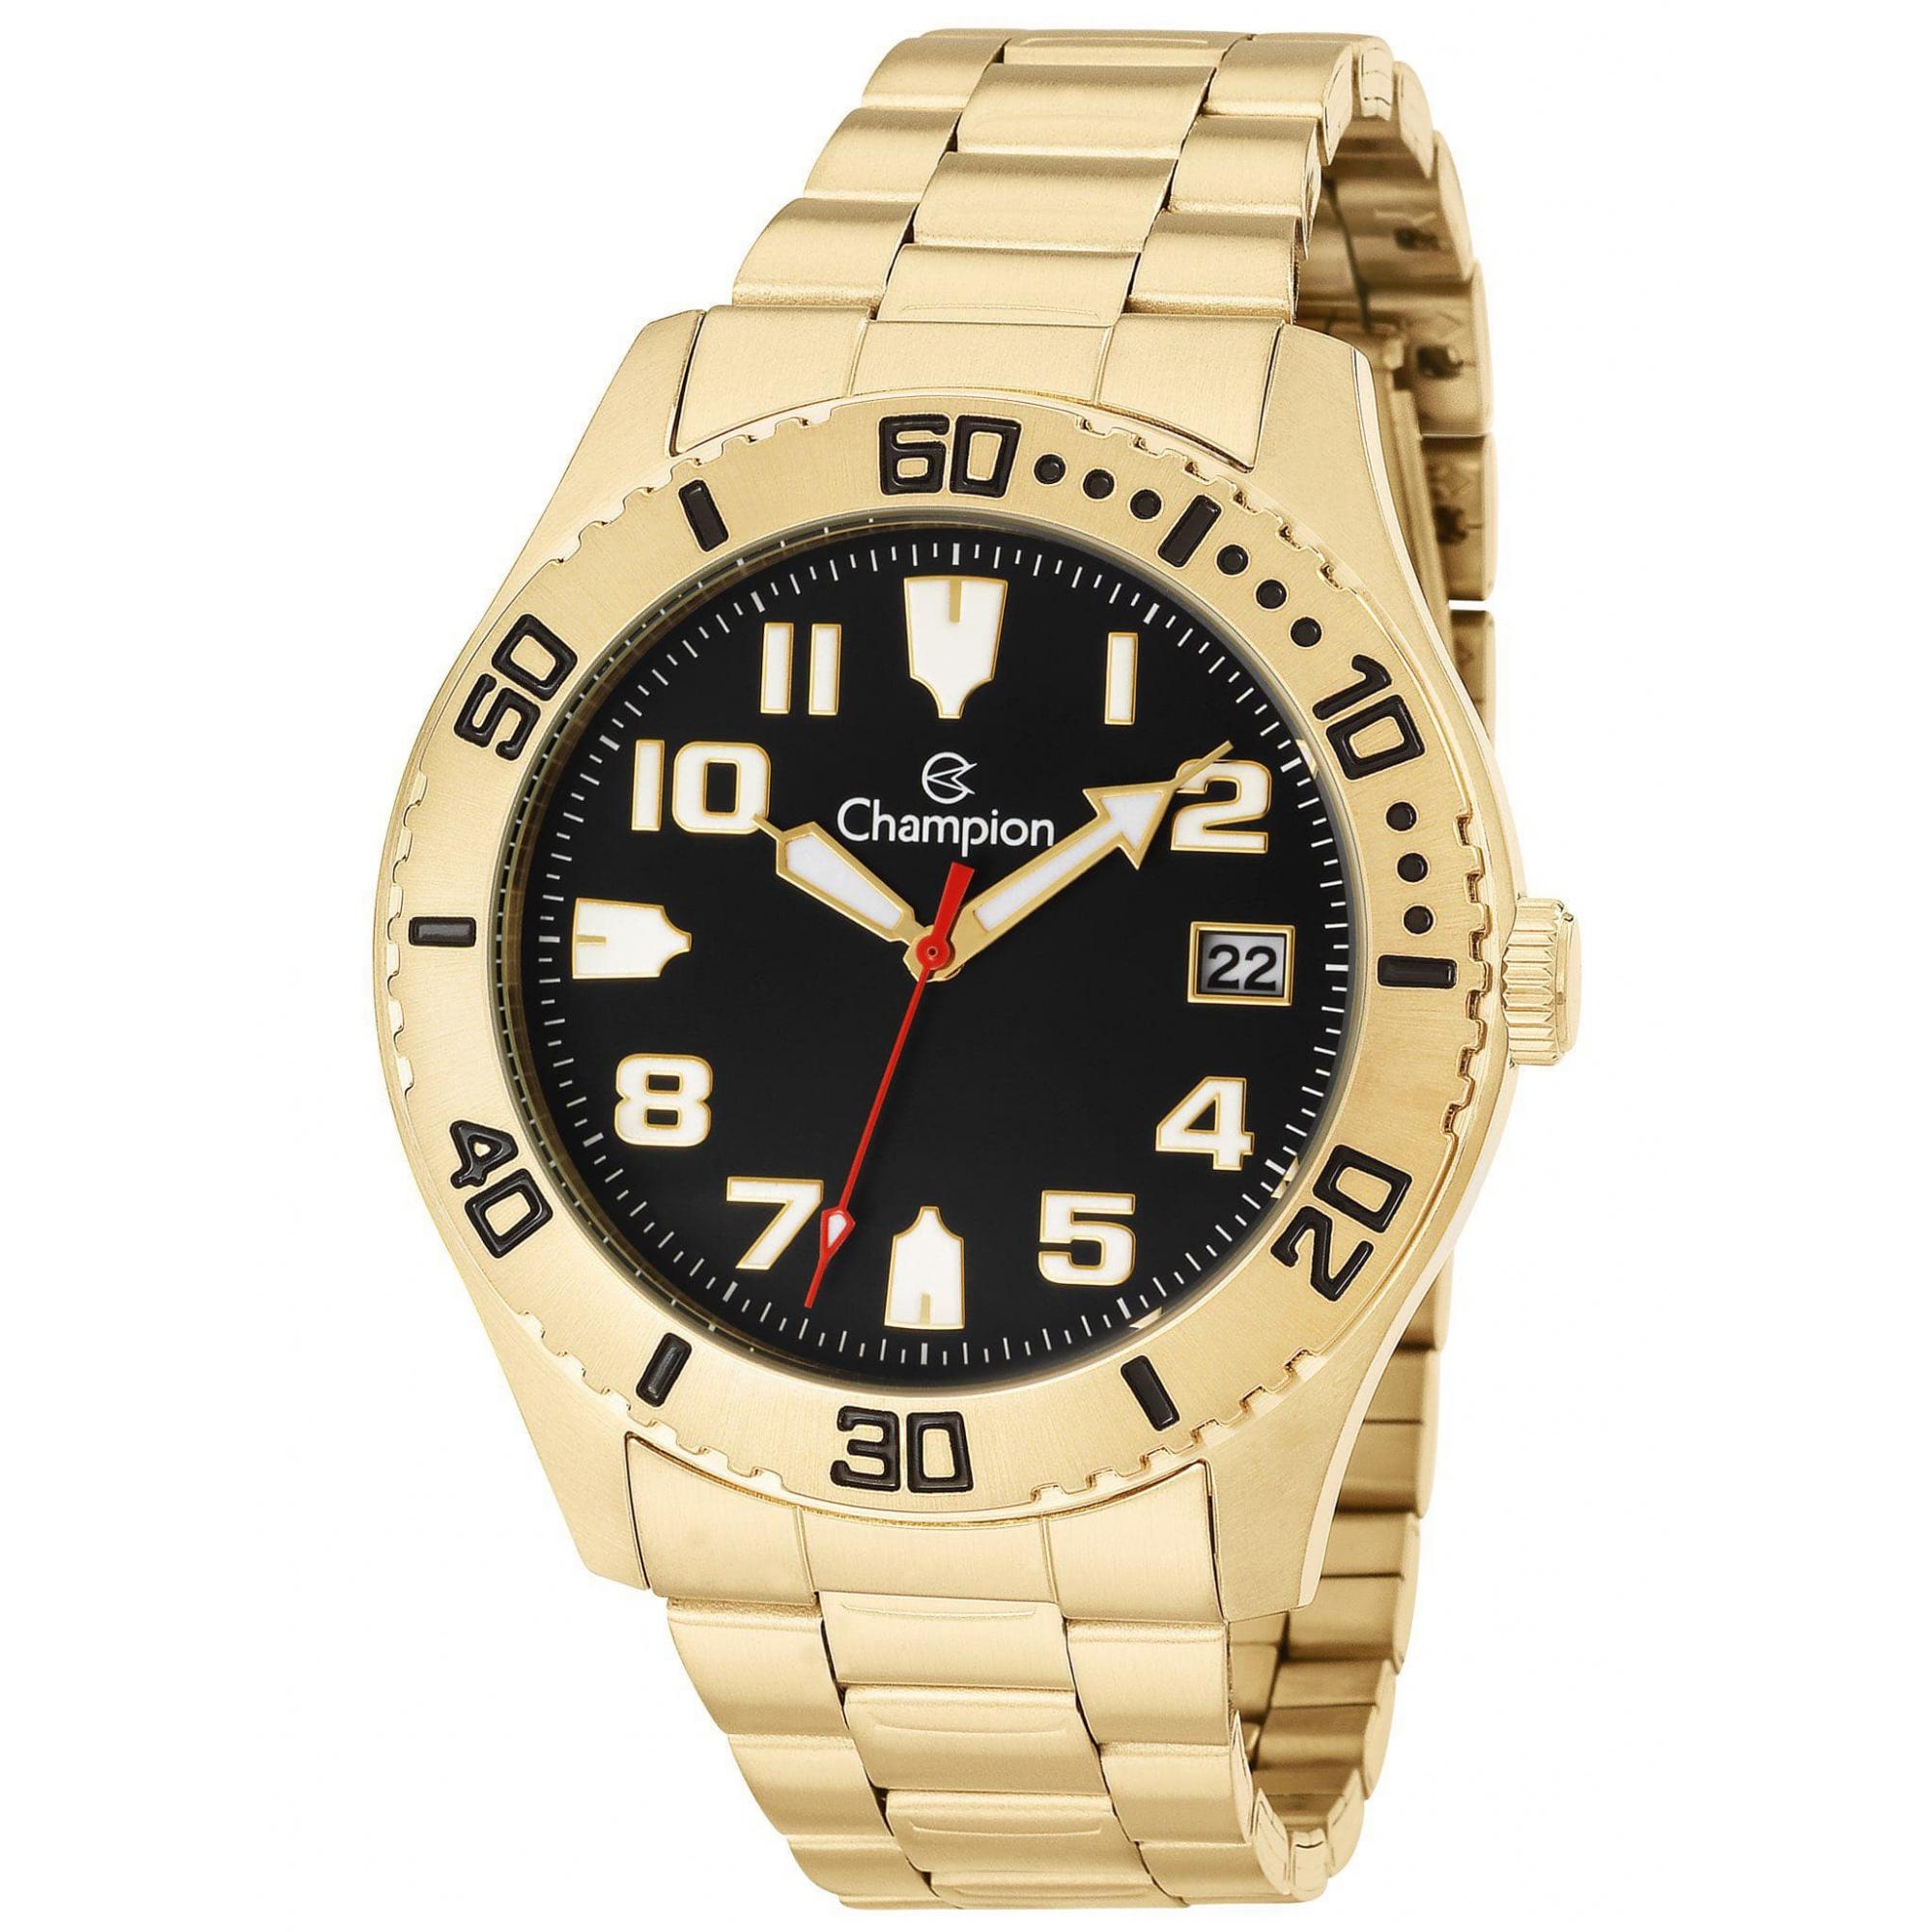 Relógio Champion Masculino Dourado Preto - Sports - CA31364U